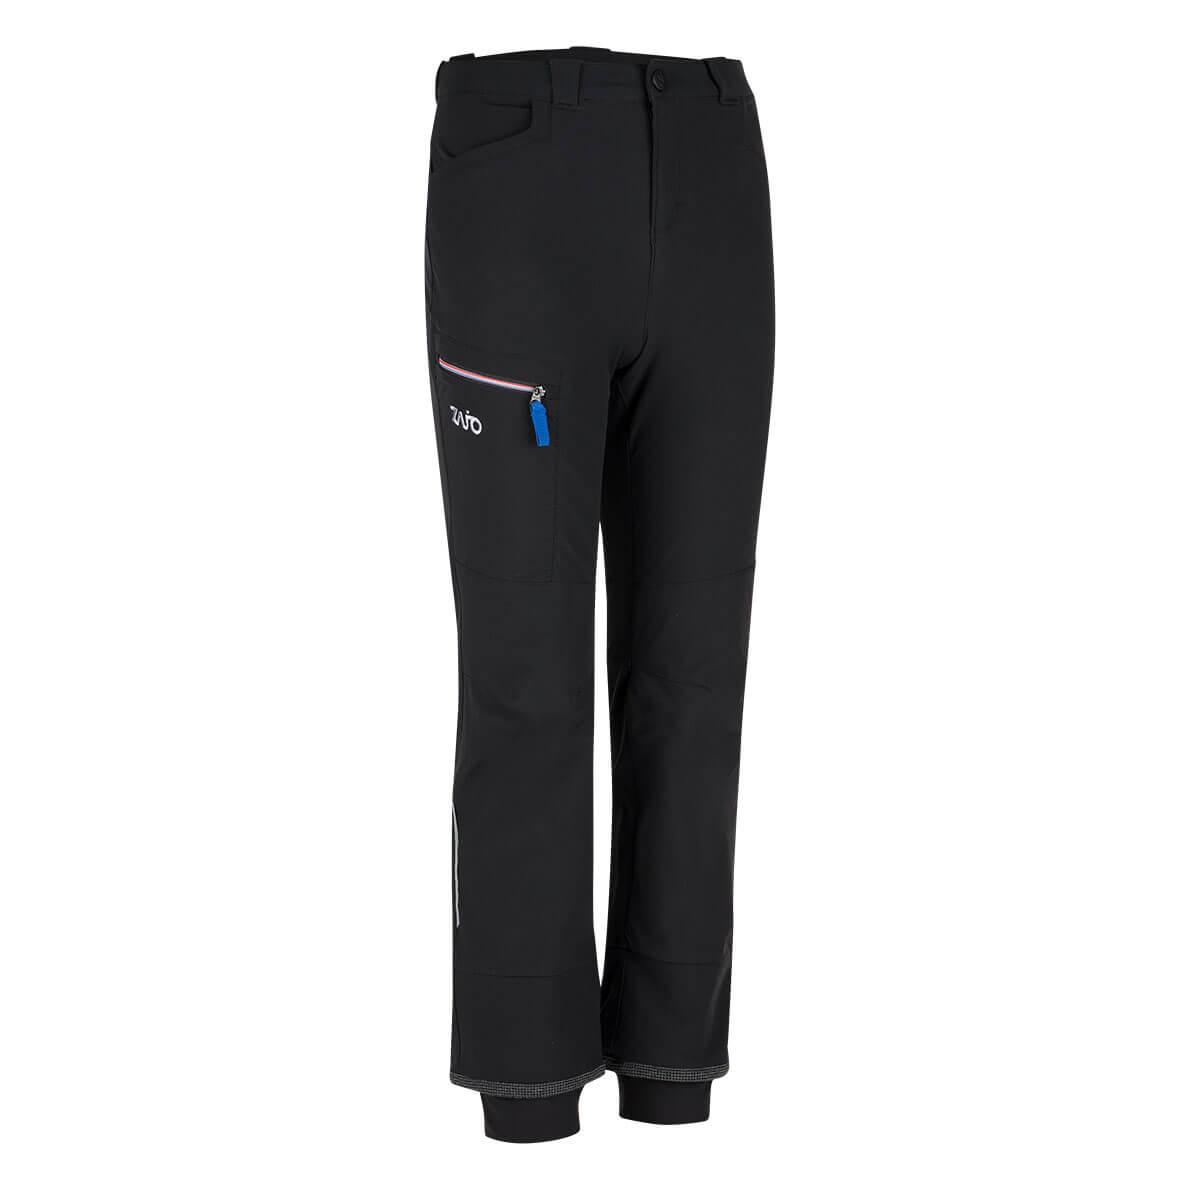 Detské nohavice Argon Kids Pants Black-Blue - veľkosť 110 - 116